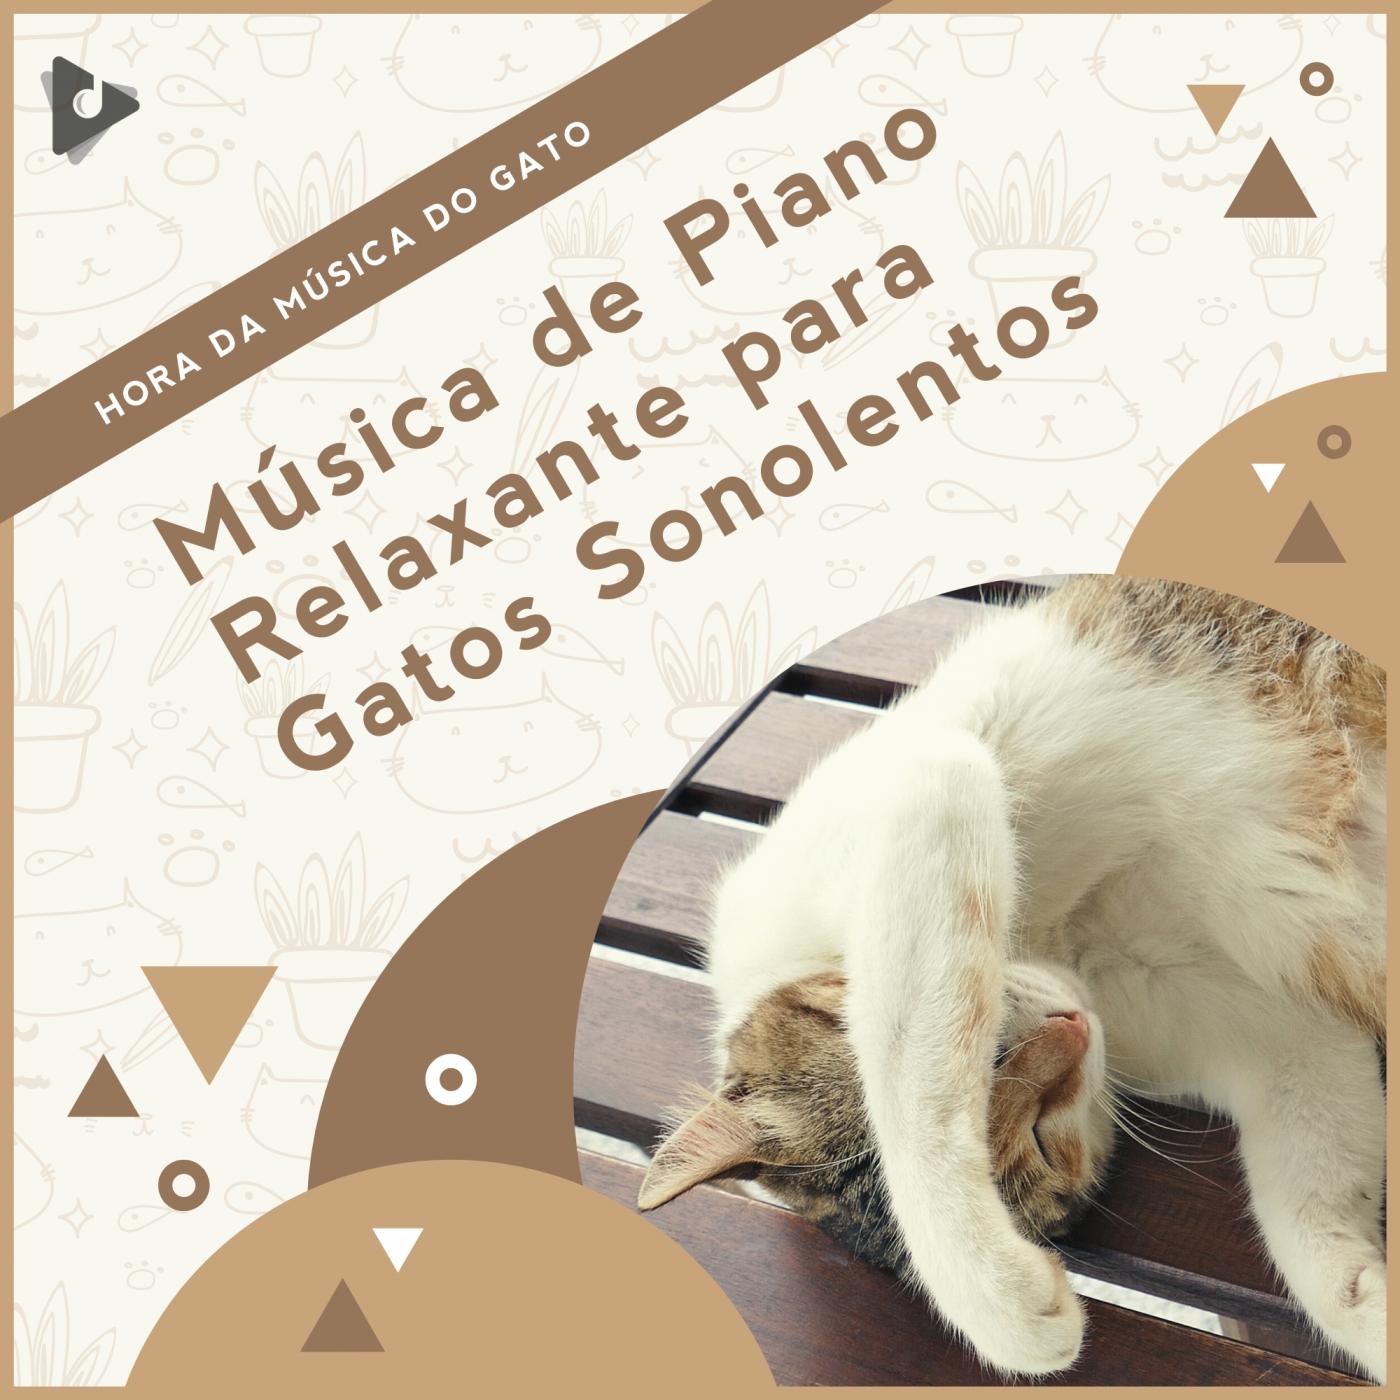 Música de Piano Relaxante para Gatos Sonolentos